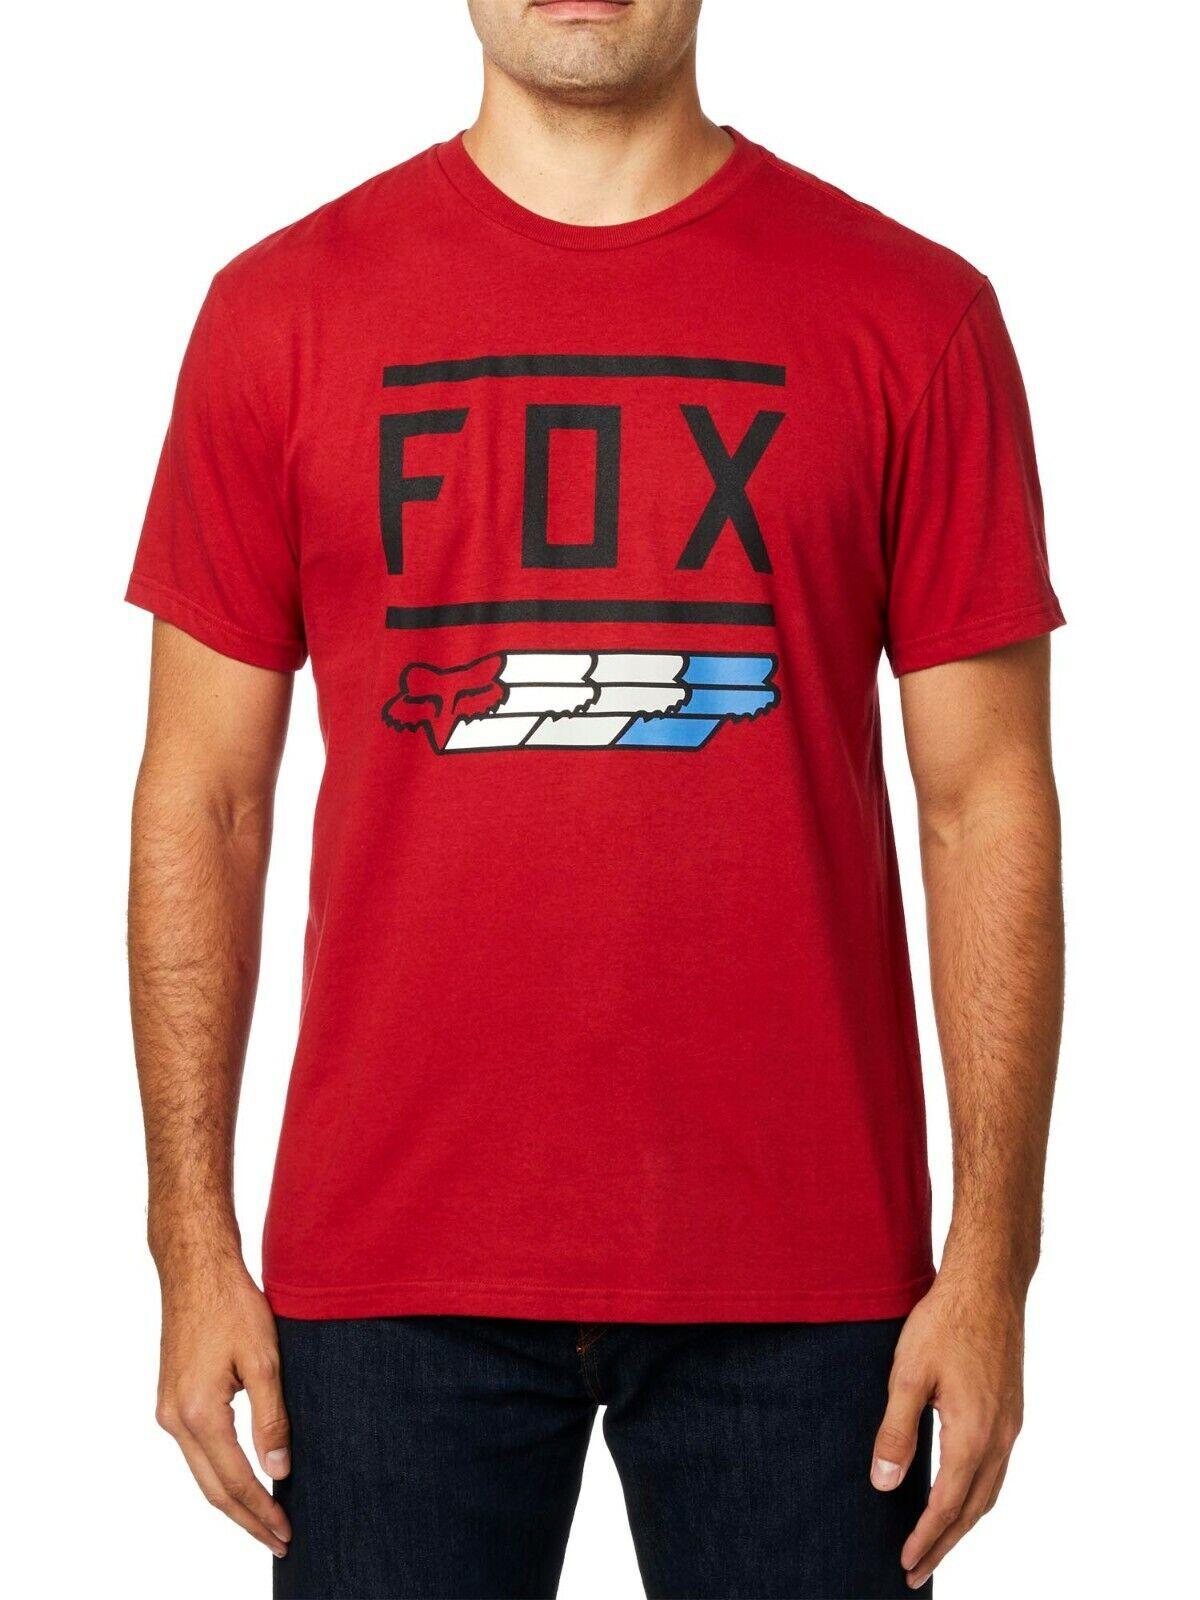 Fox Racing Men's Fox Super Short Sleeve T-shirt Foxhead Moto